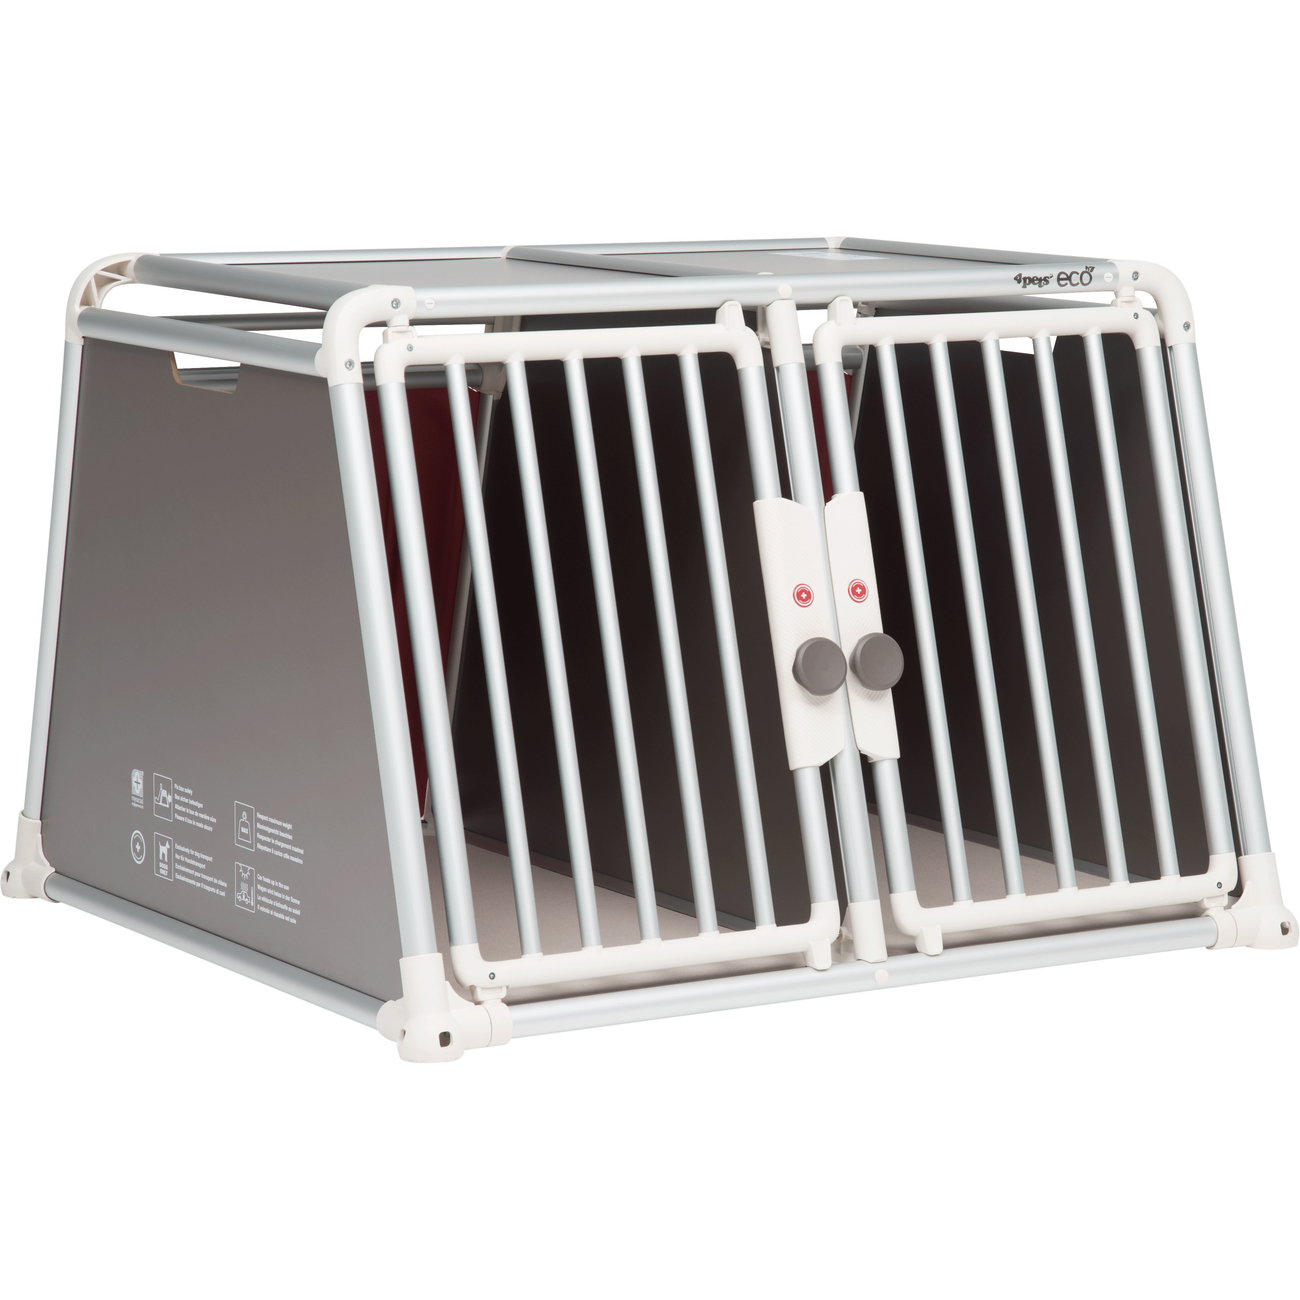 4pets Alu Autobox für 2 Hunde ECO 22